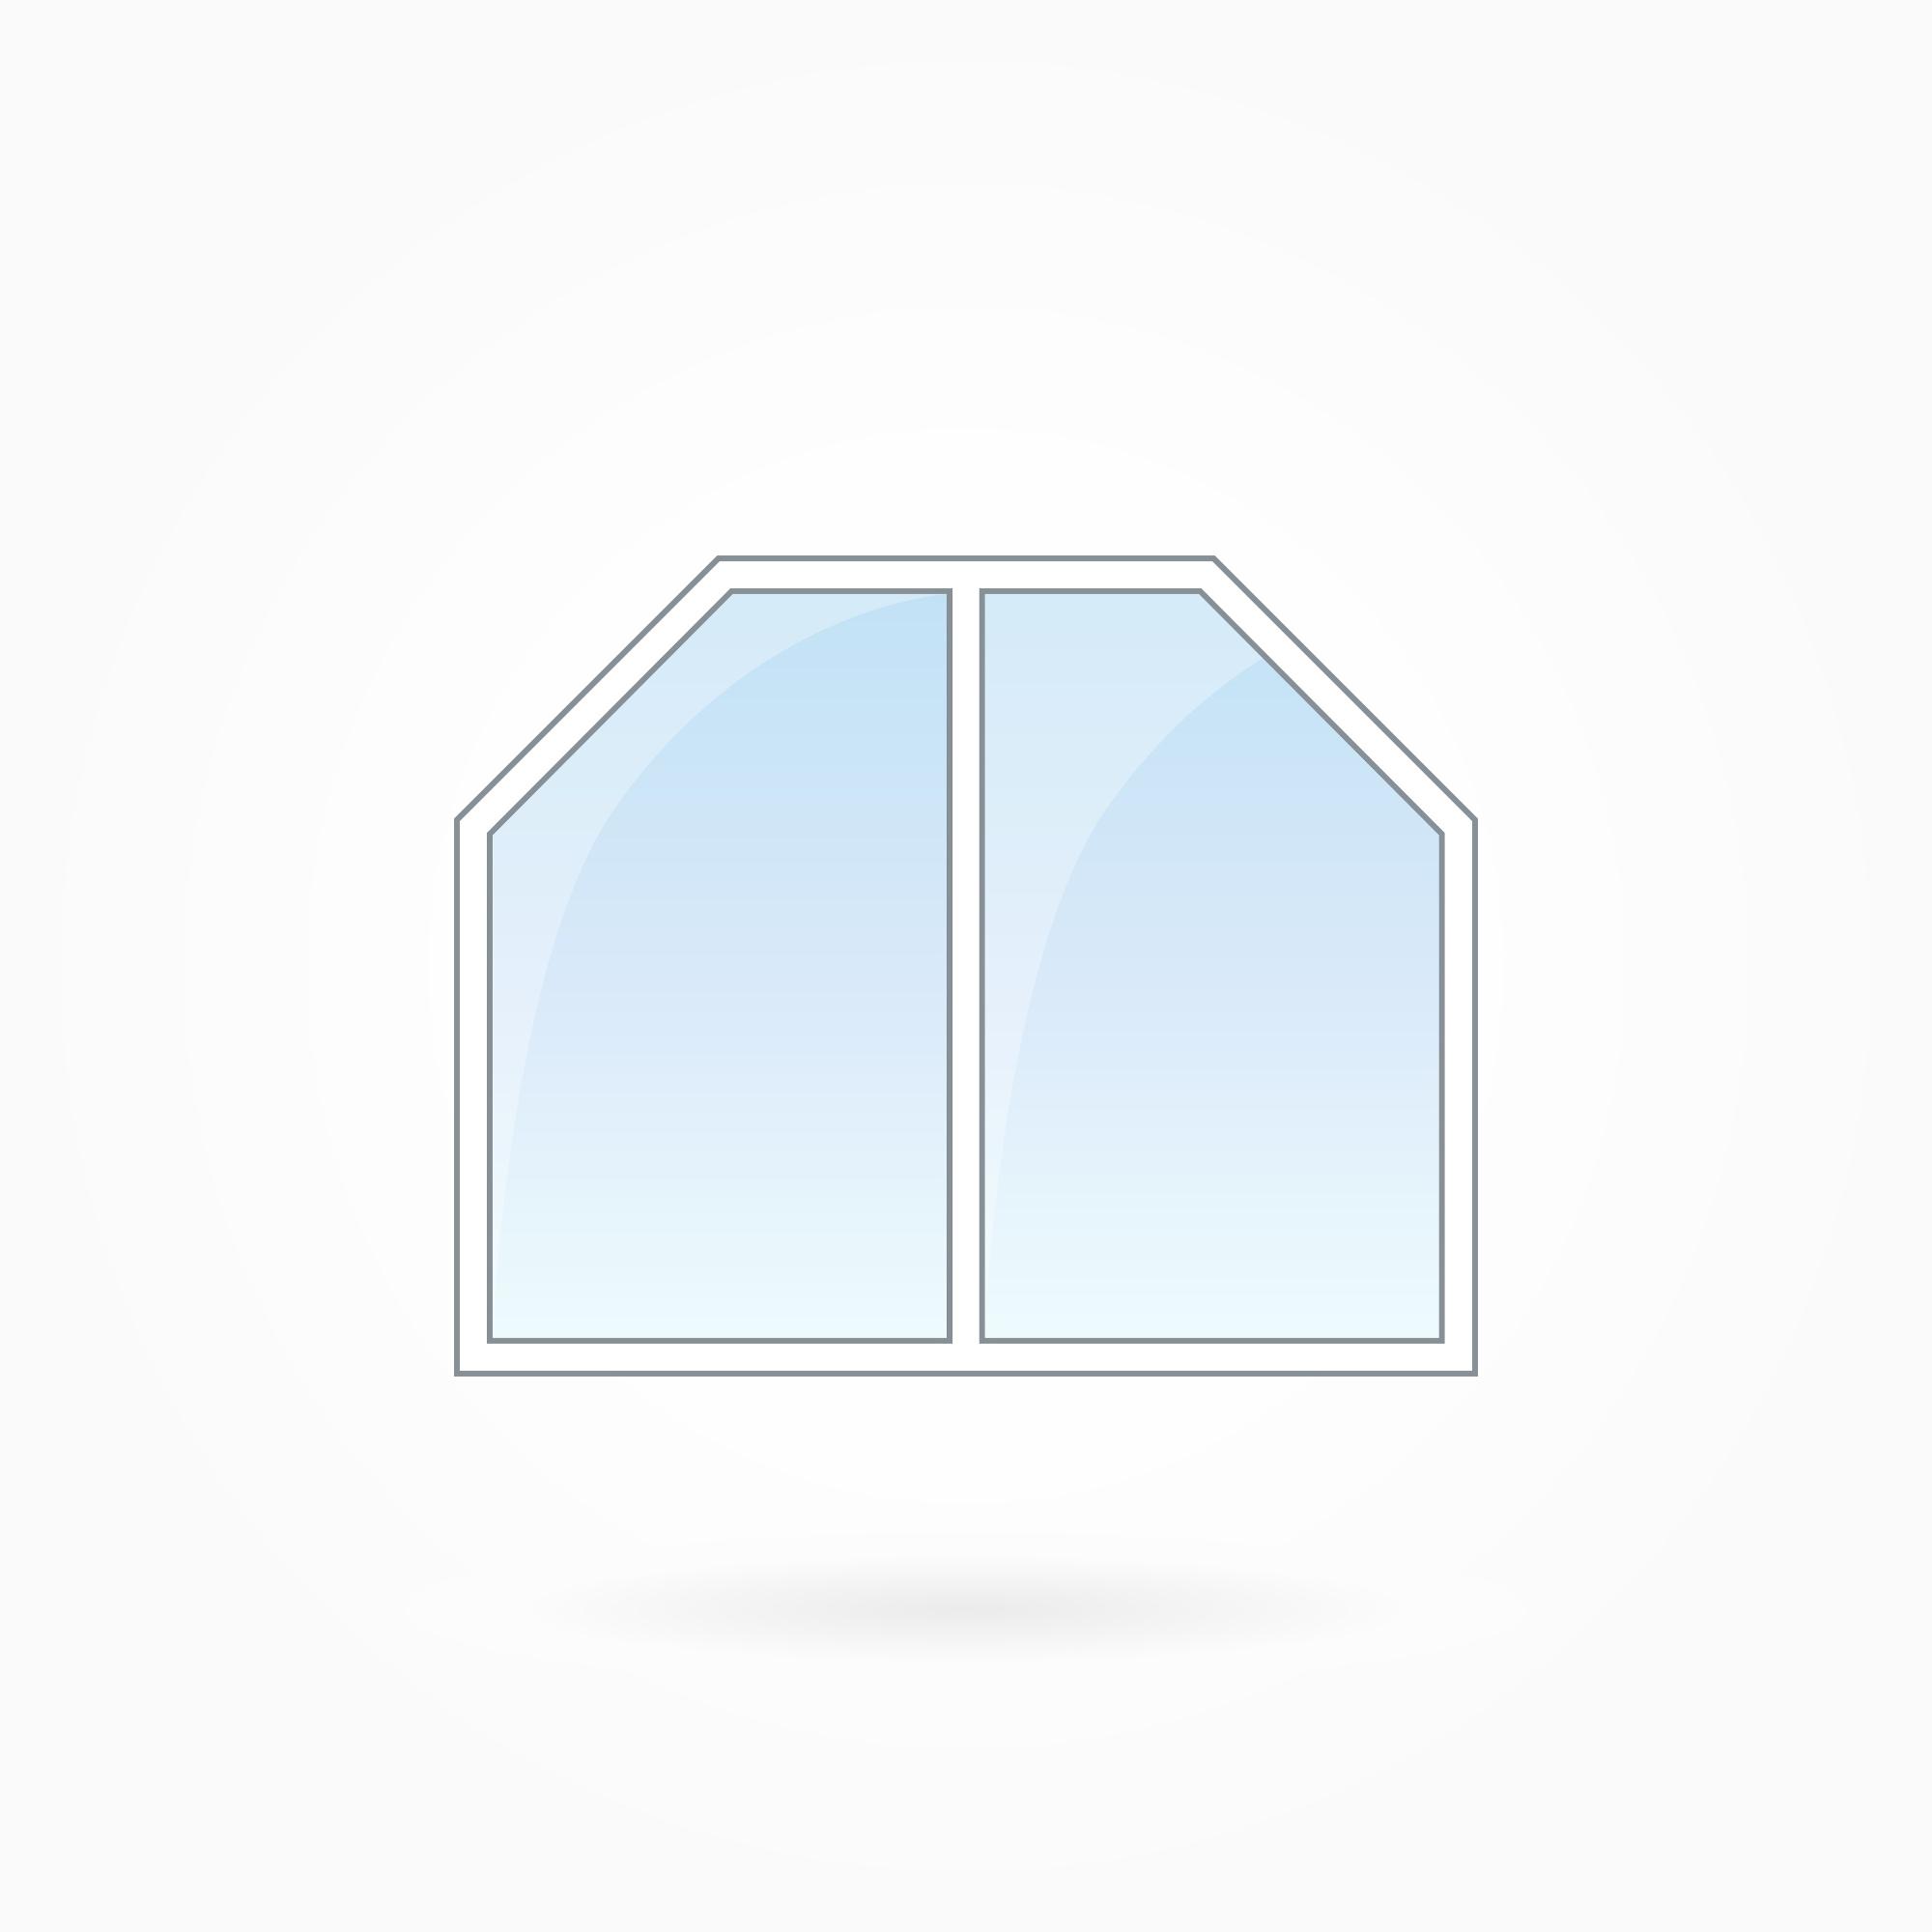 Trapezförmiges Fenster